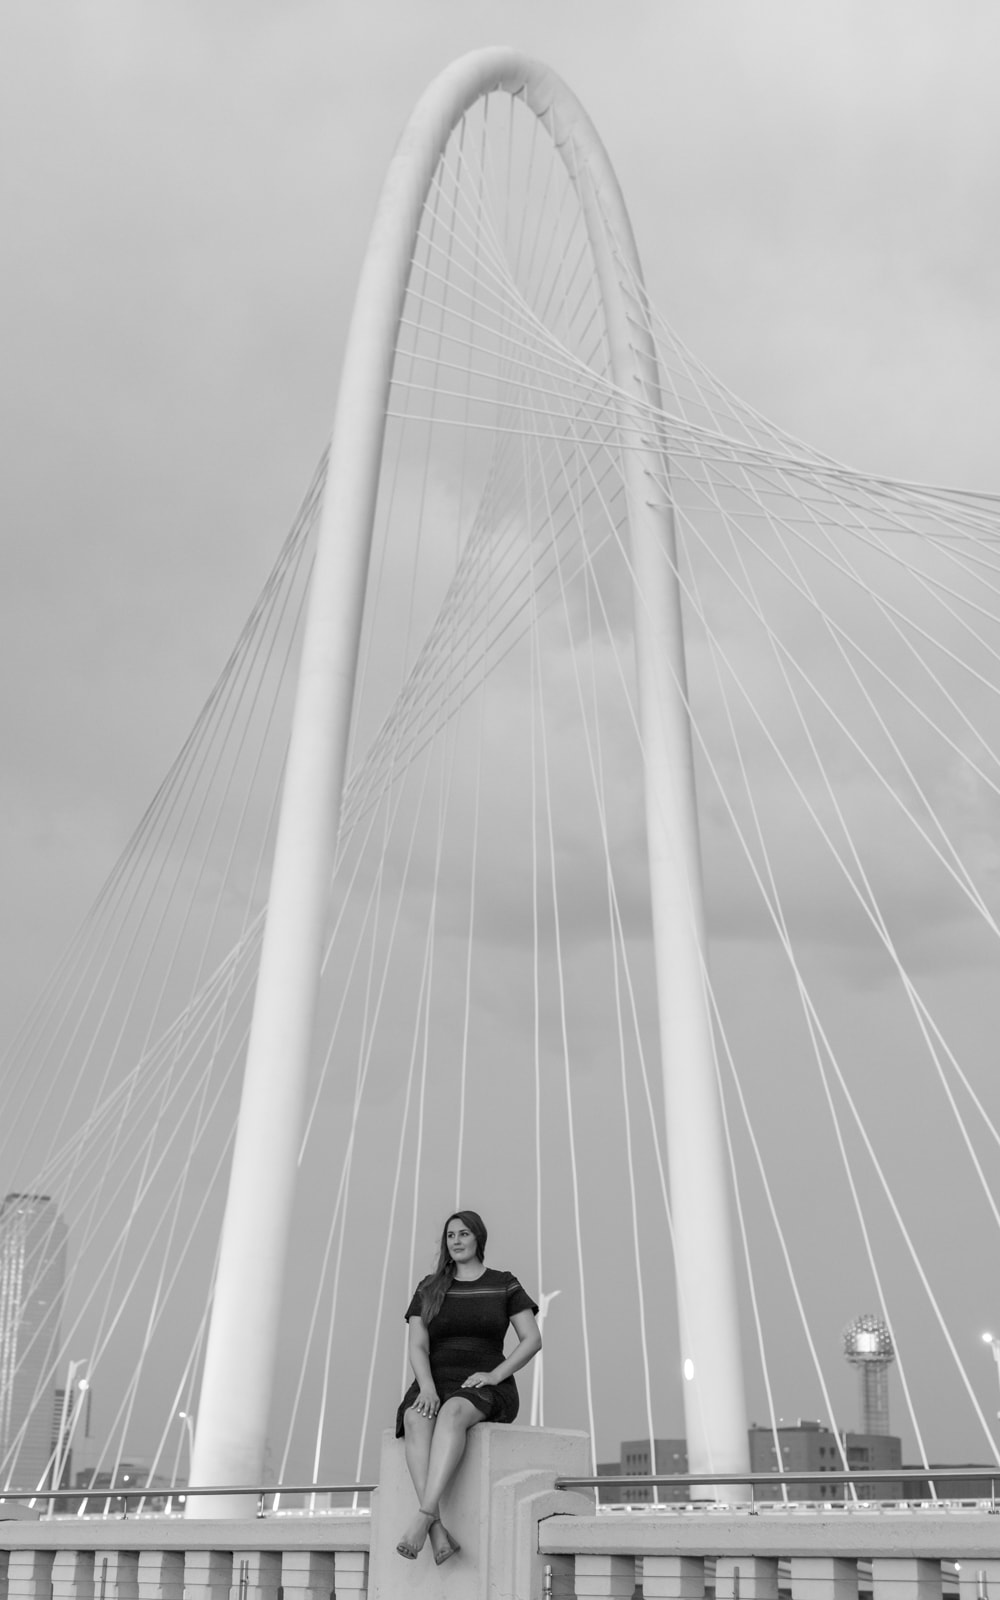 Andrea Rader at the Margaret Hunt Hill Bridge